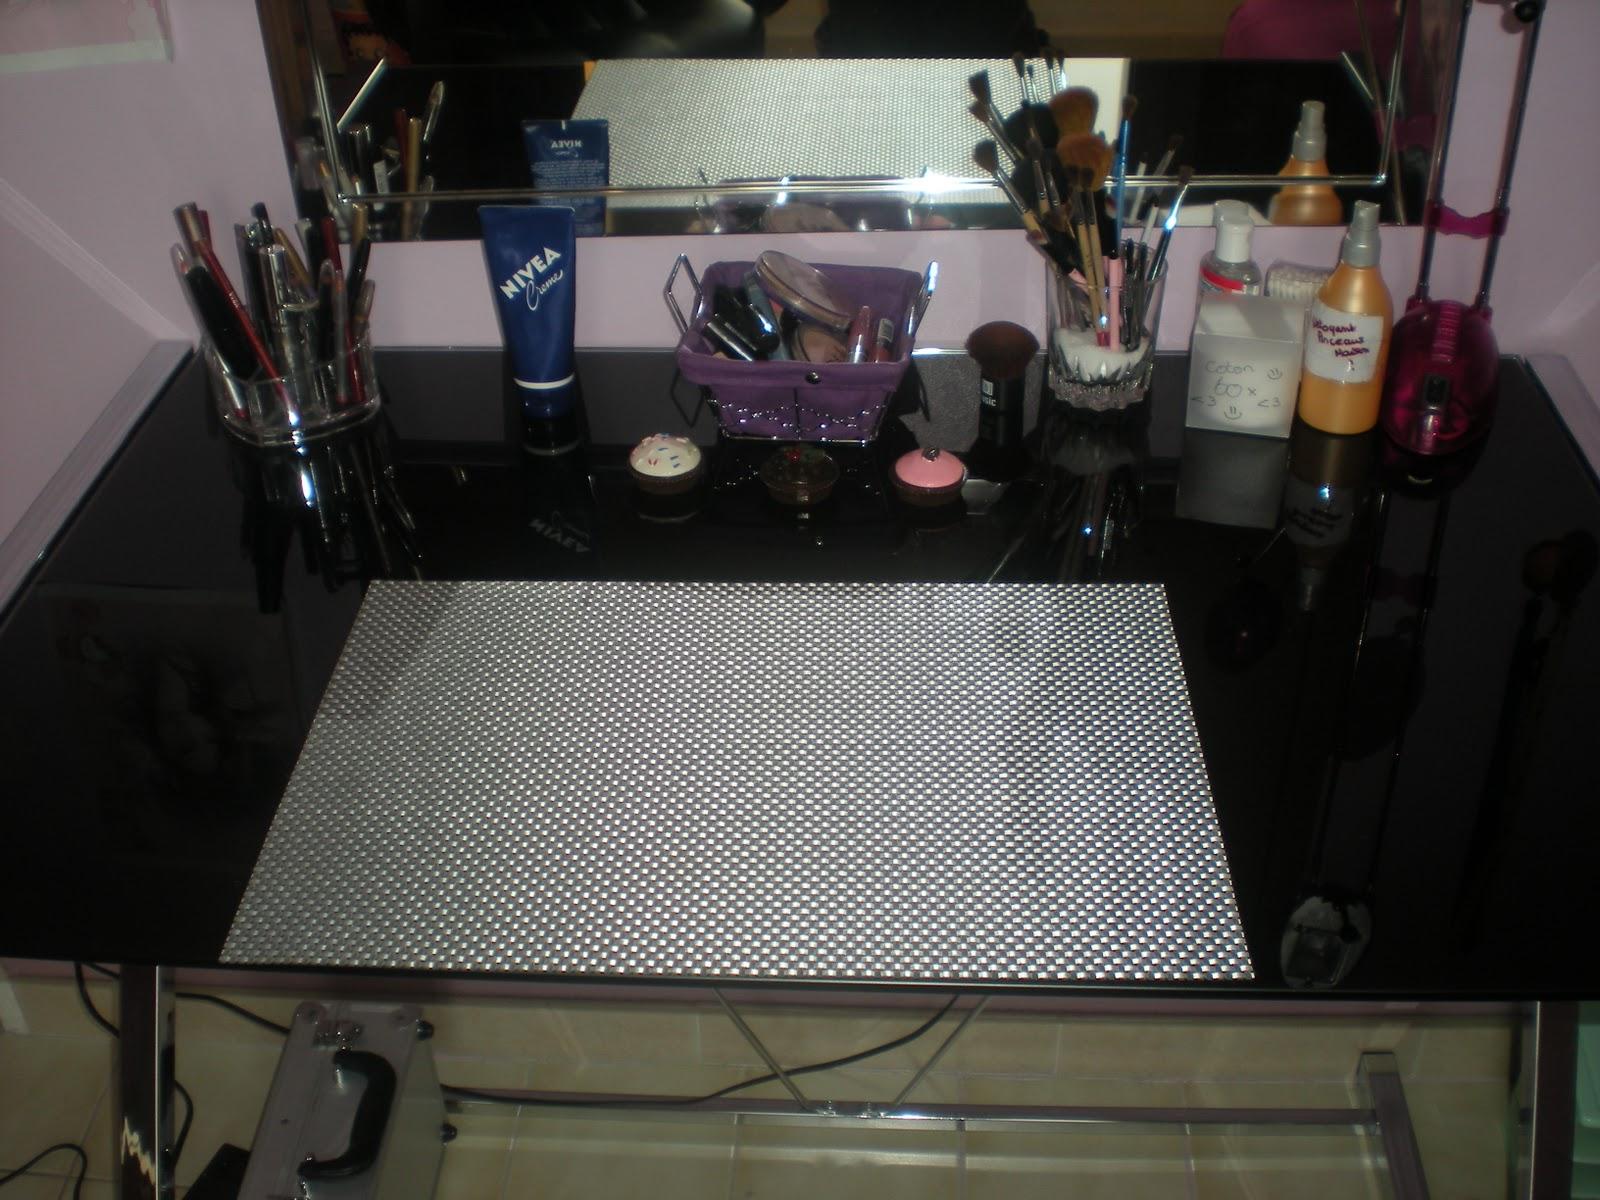 conseil beaut mon rangement maquillage. Black Bedroom Furniture Sets. Home Design Ideas